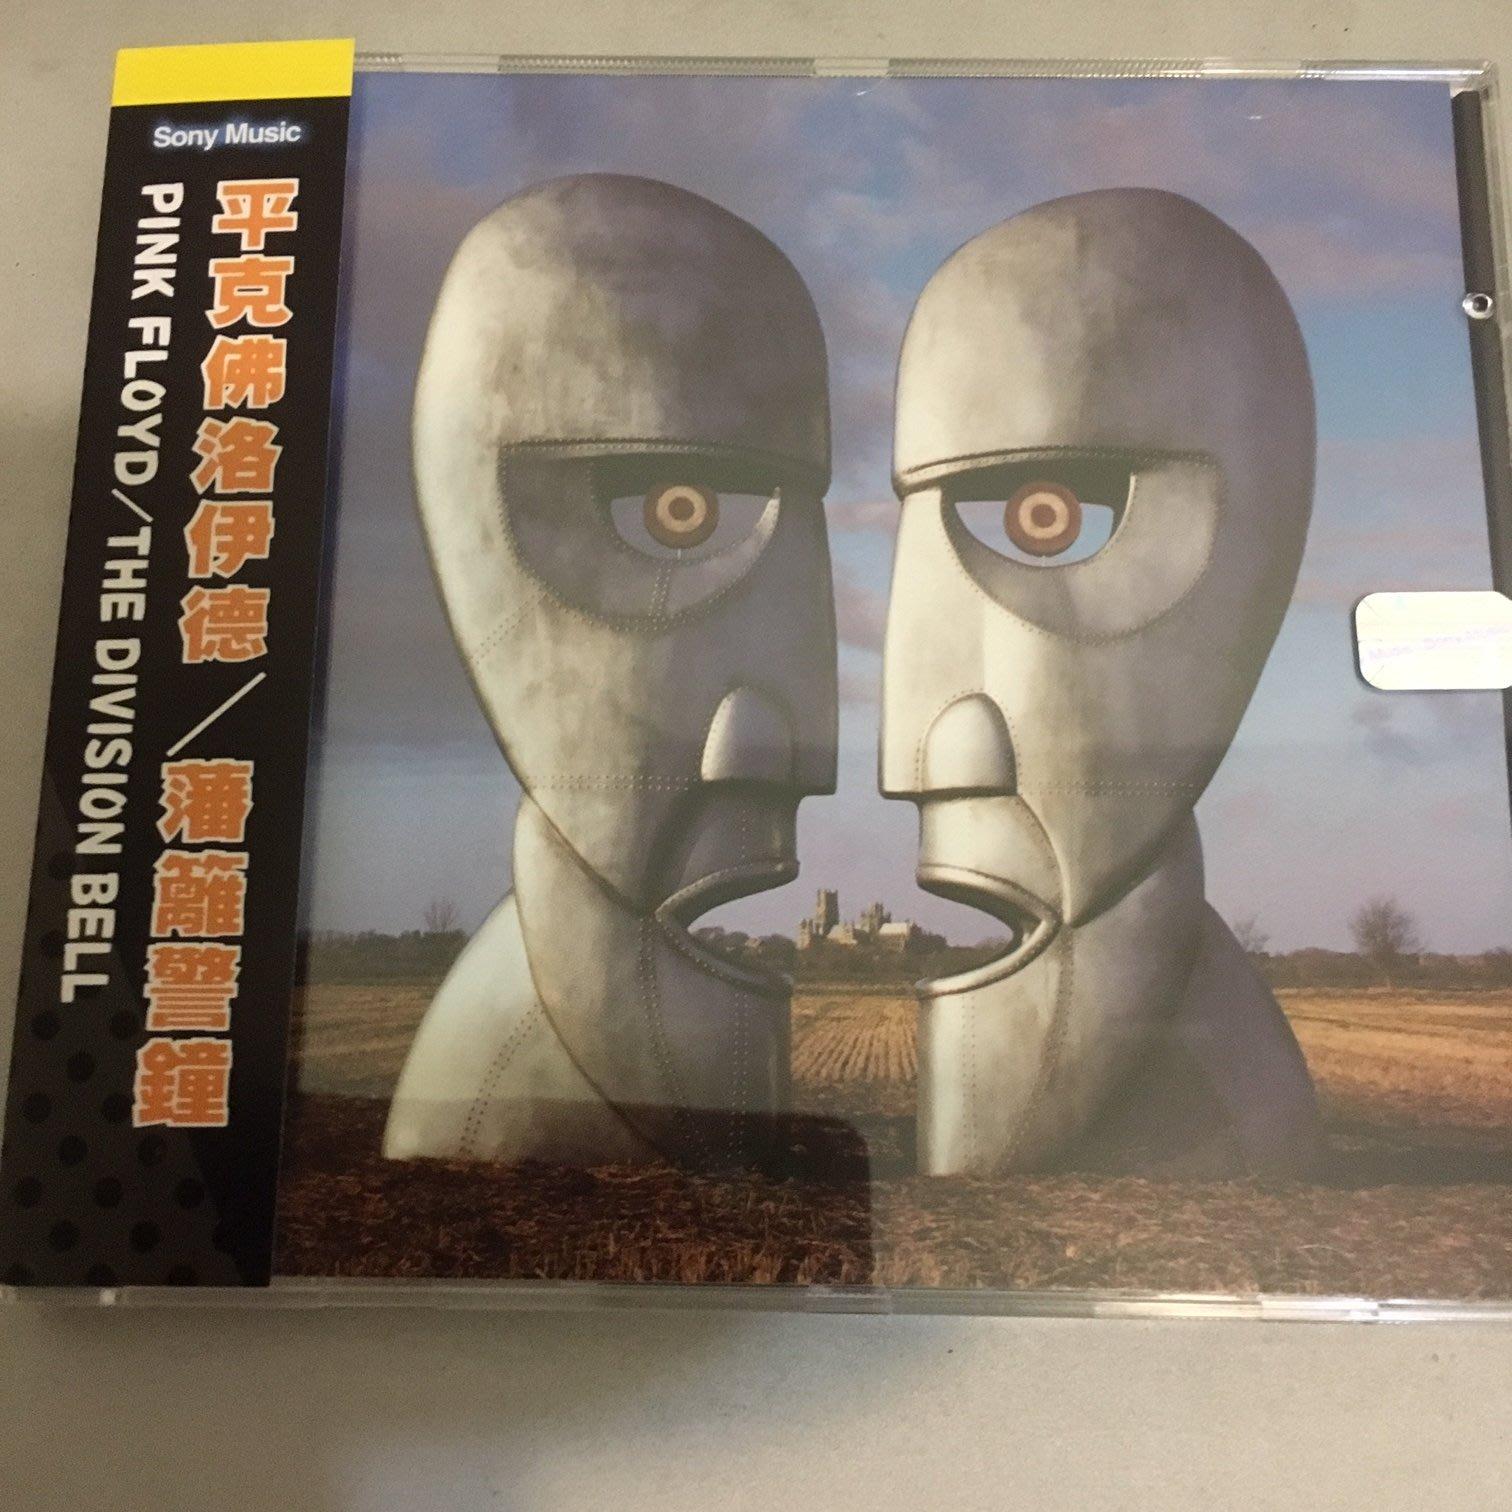 *愛樂熊貓*Pink Floyd平克佛洛依德THE DIVISION BELL藩籬警鐘94美首版(無ifpi)